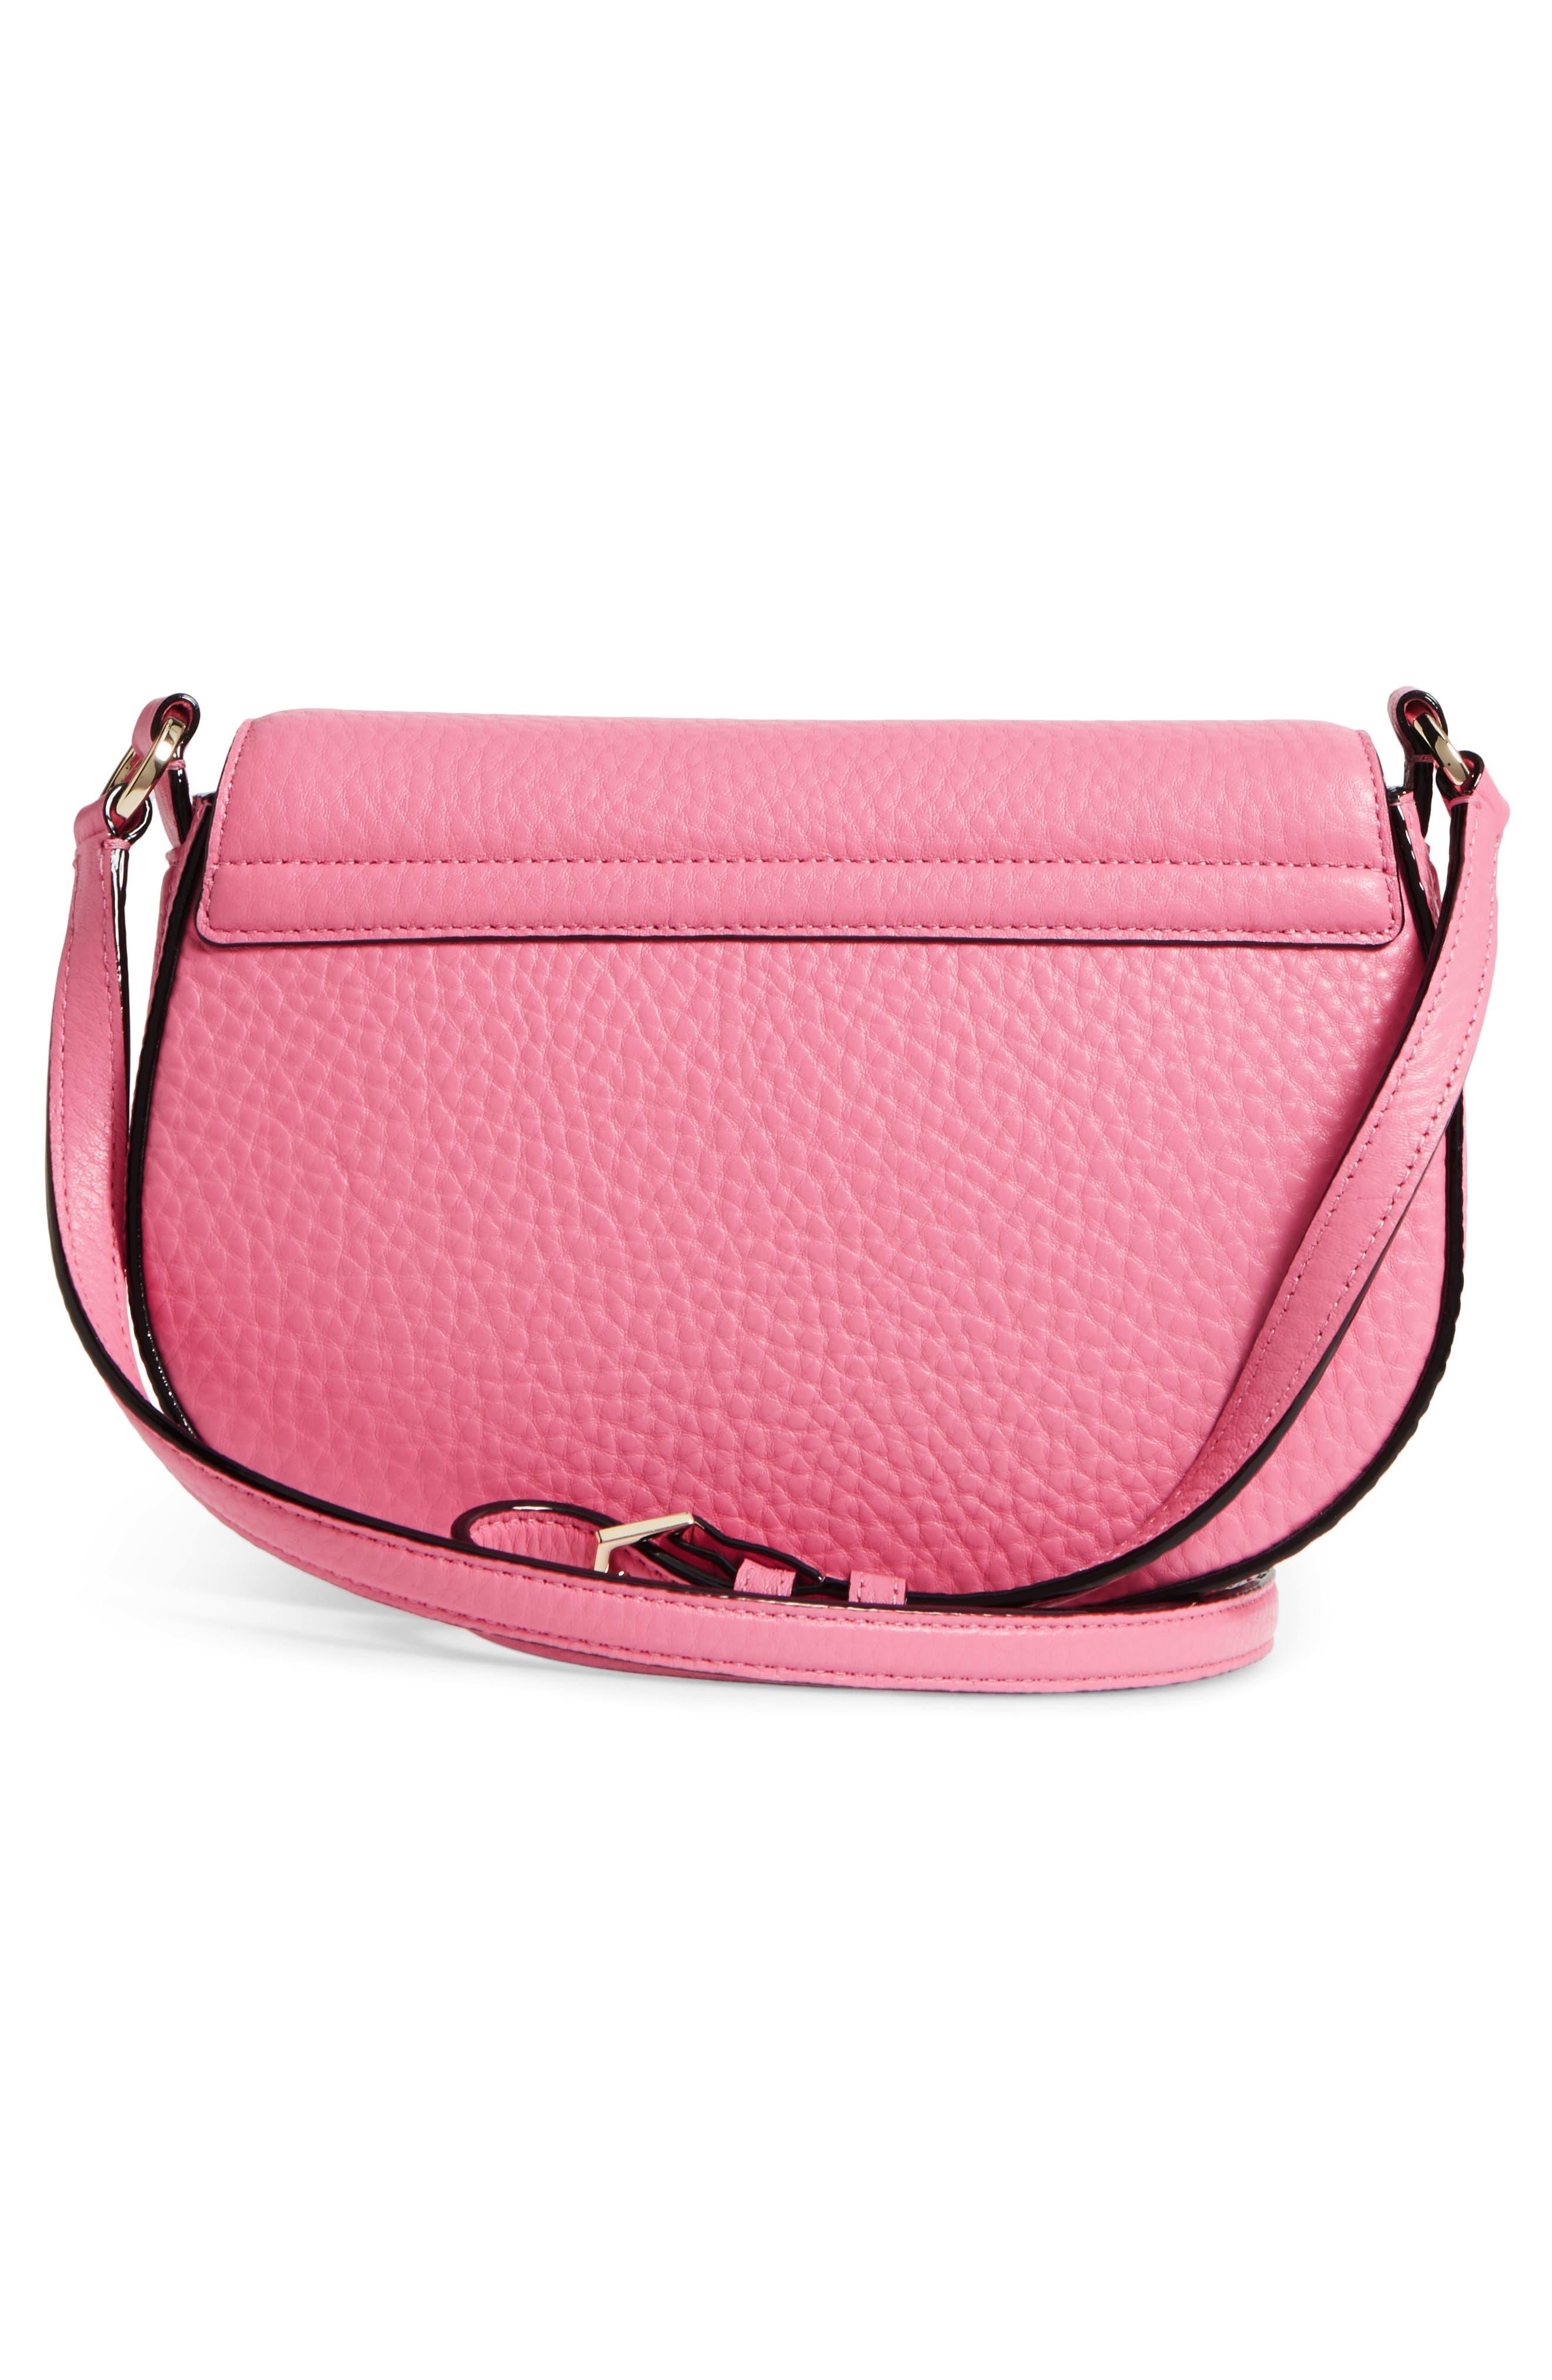 carlyle street - kallie leather saddle bag,                             Alternate thumbnail 3, color,                             Pink Sunset